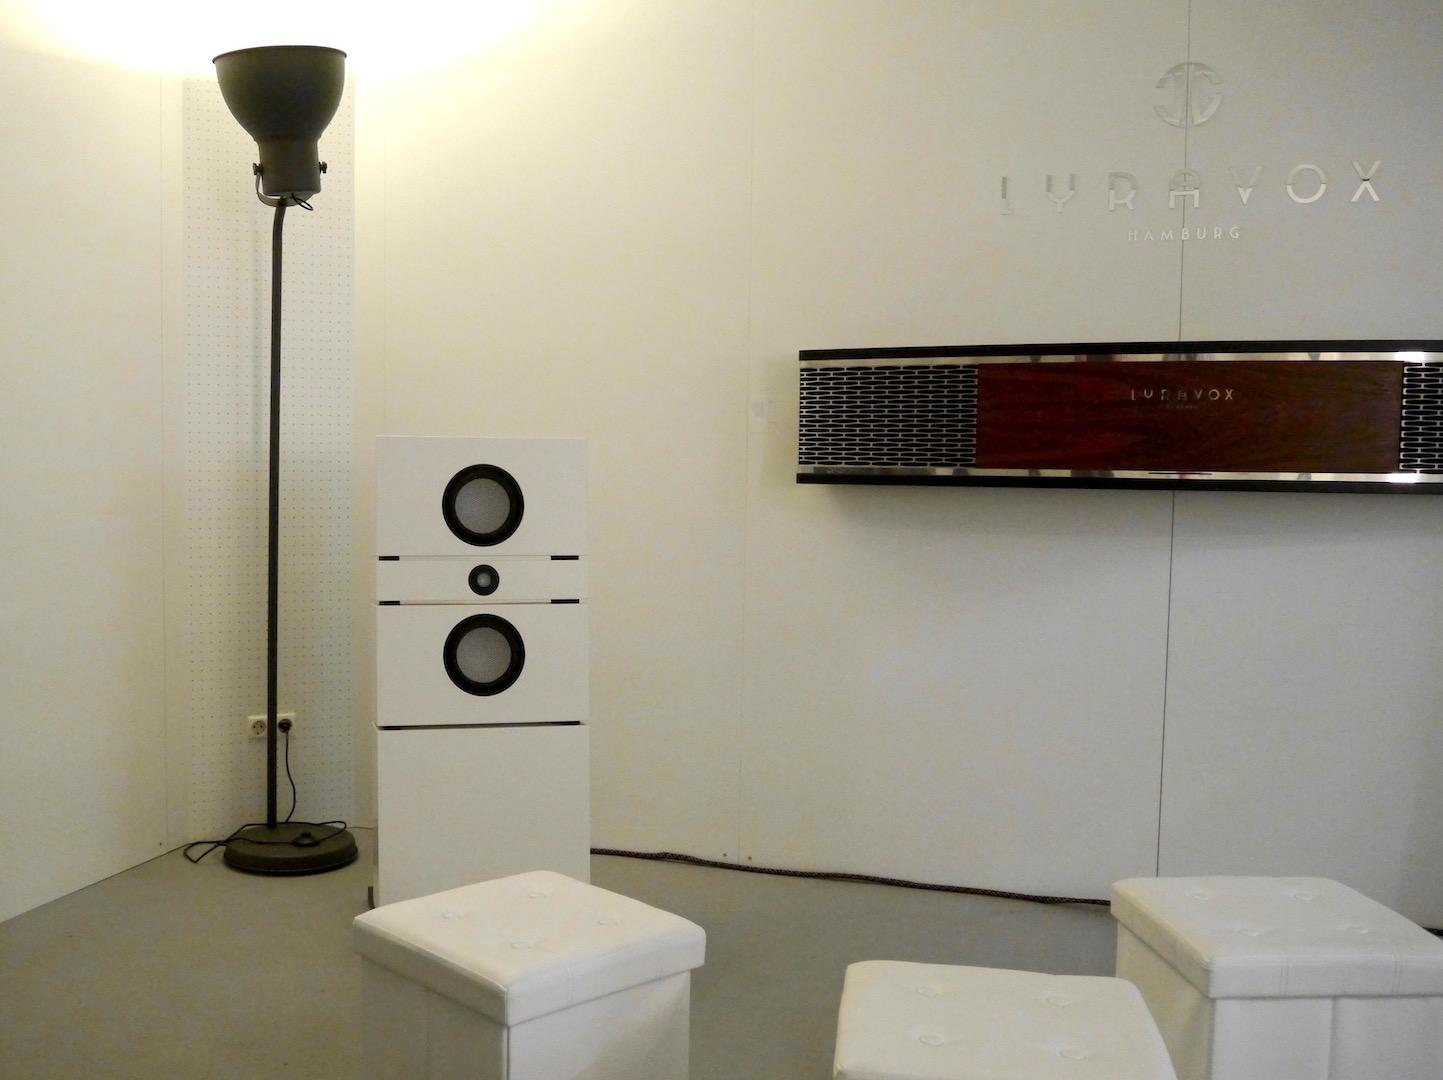 Lyravox Lautsprechersystem an der Wand und daneben am Boden